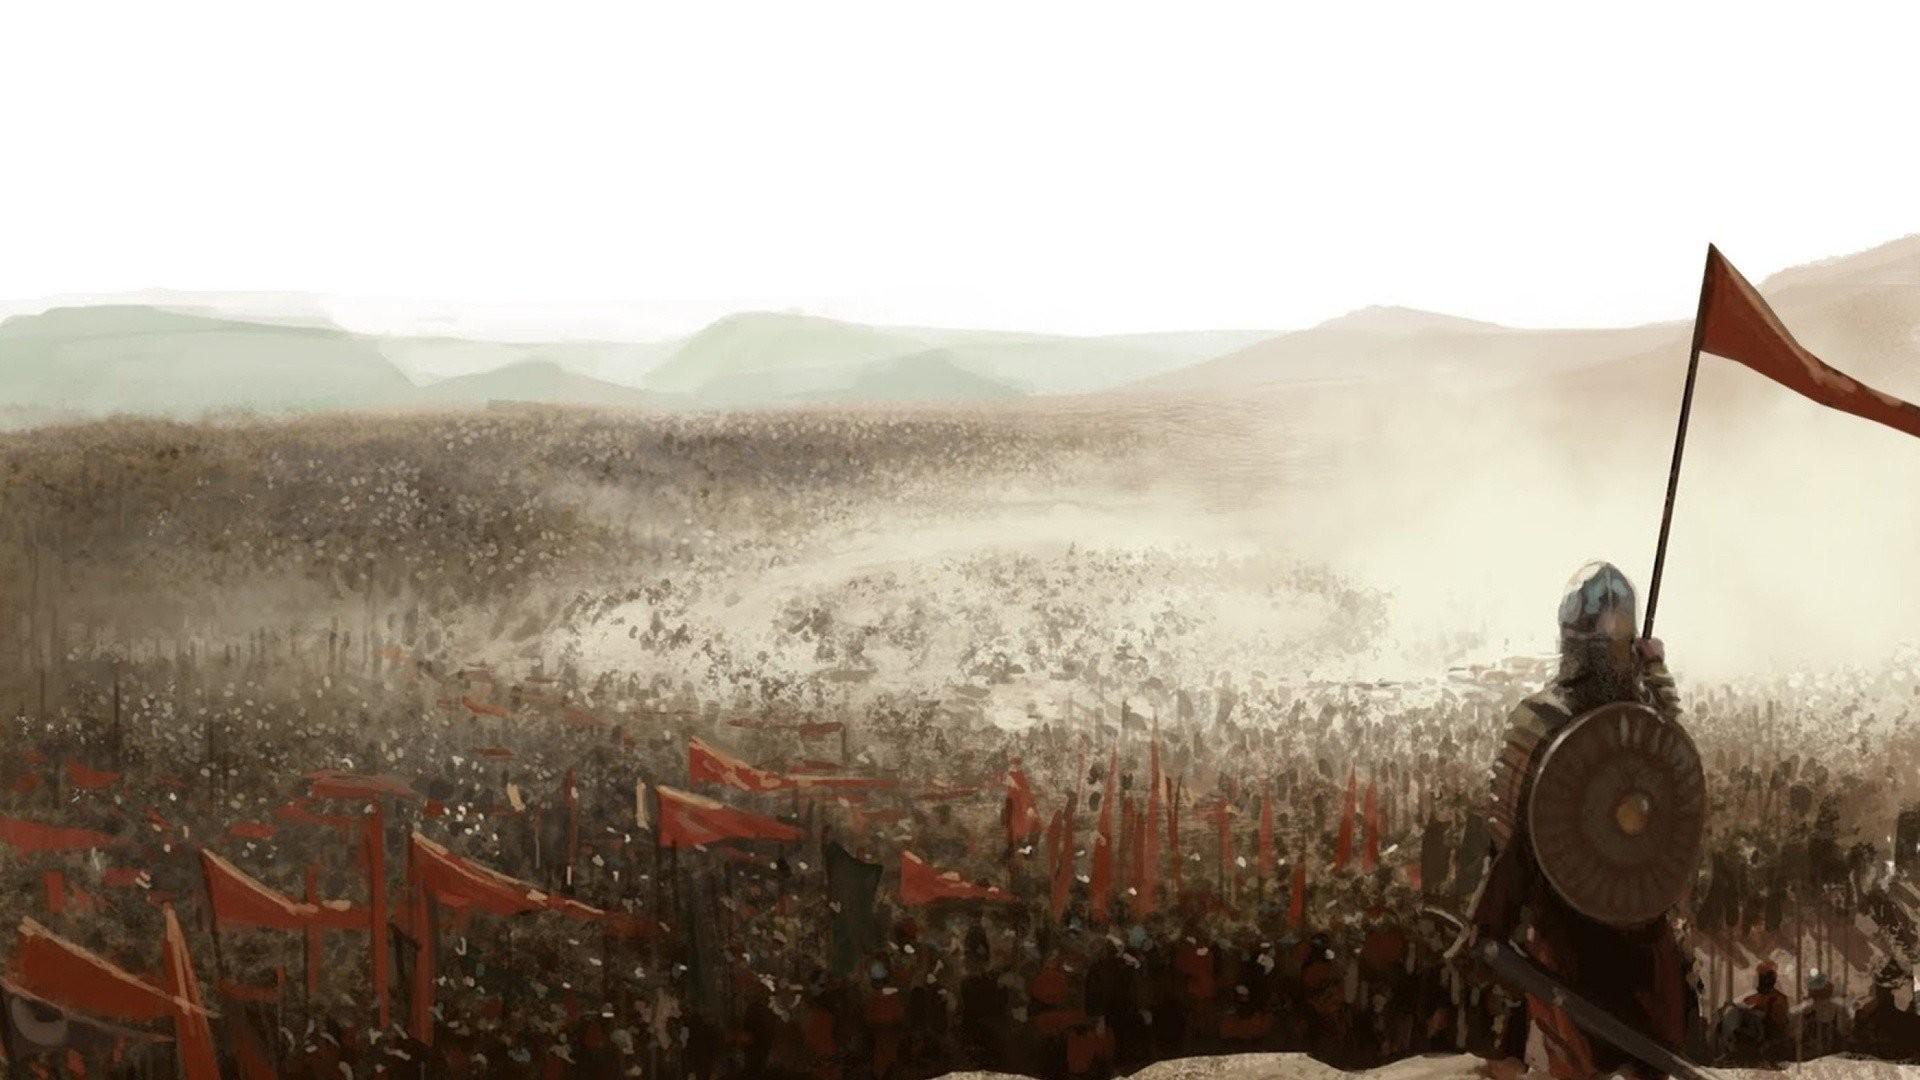 Soldiers war fantasy art Kingdom of Heaven battles .